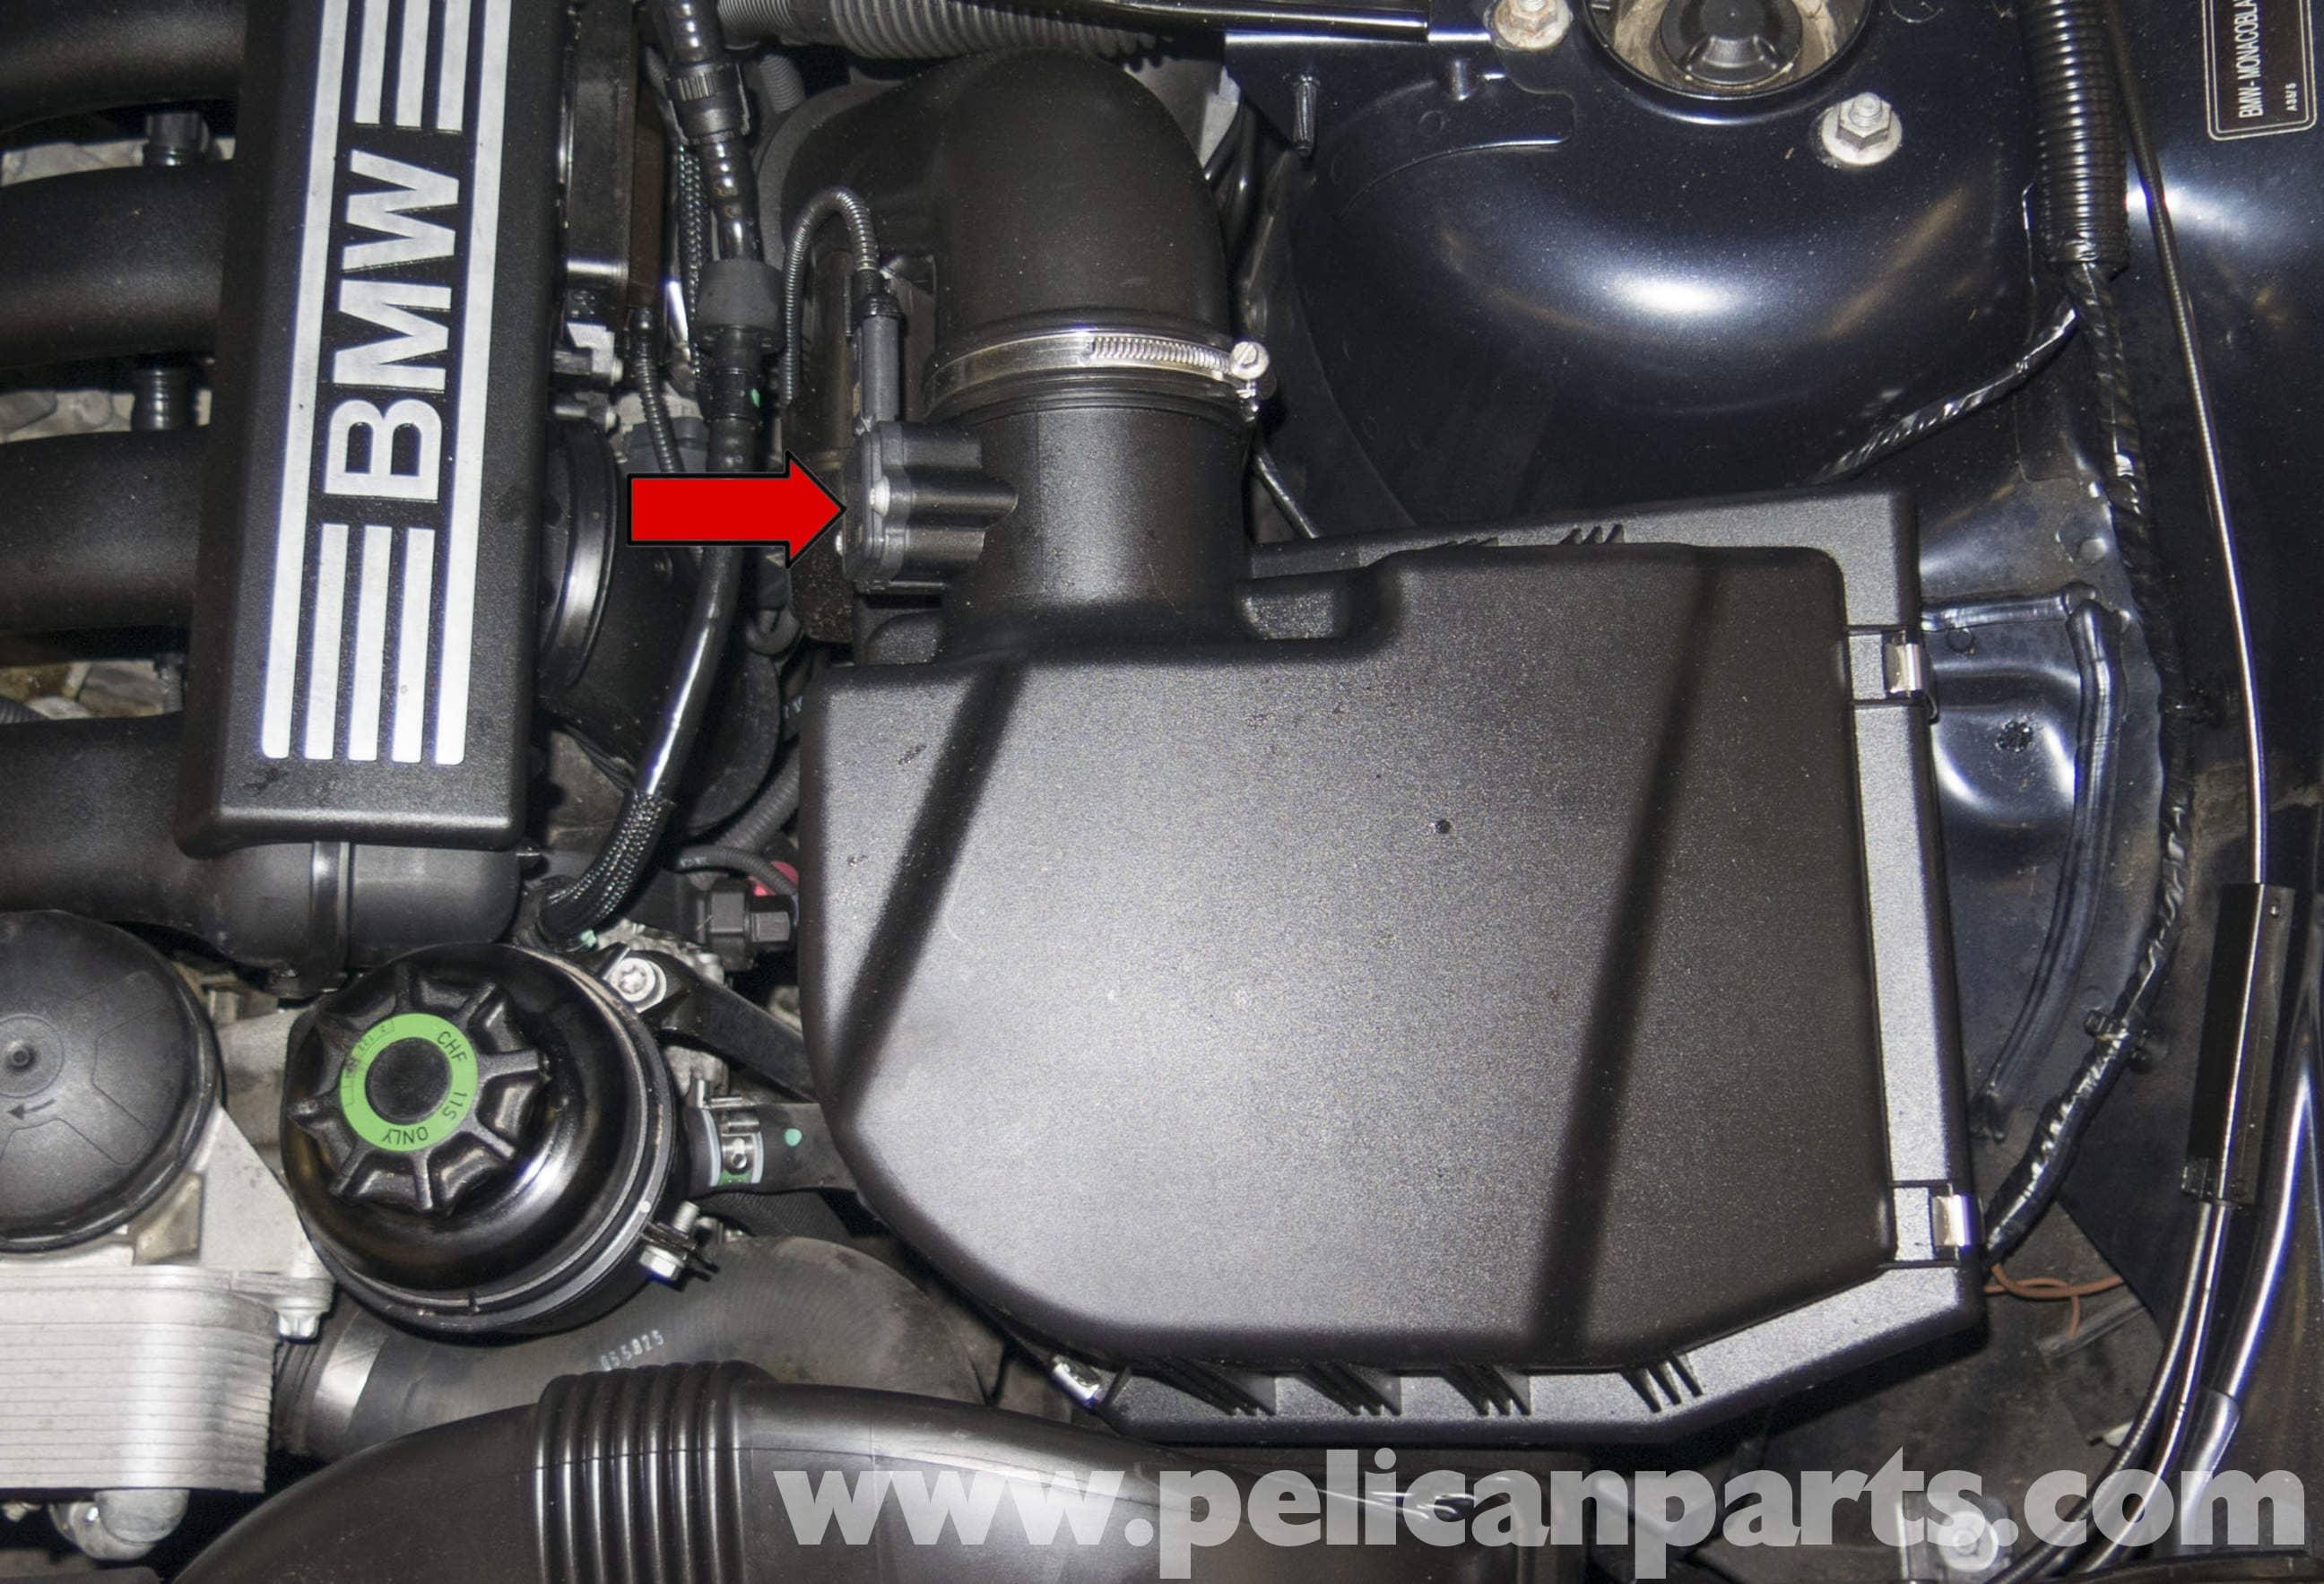 Pelican Parts Technical Article - BMW-X3 - Mass Air Flow